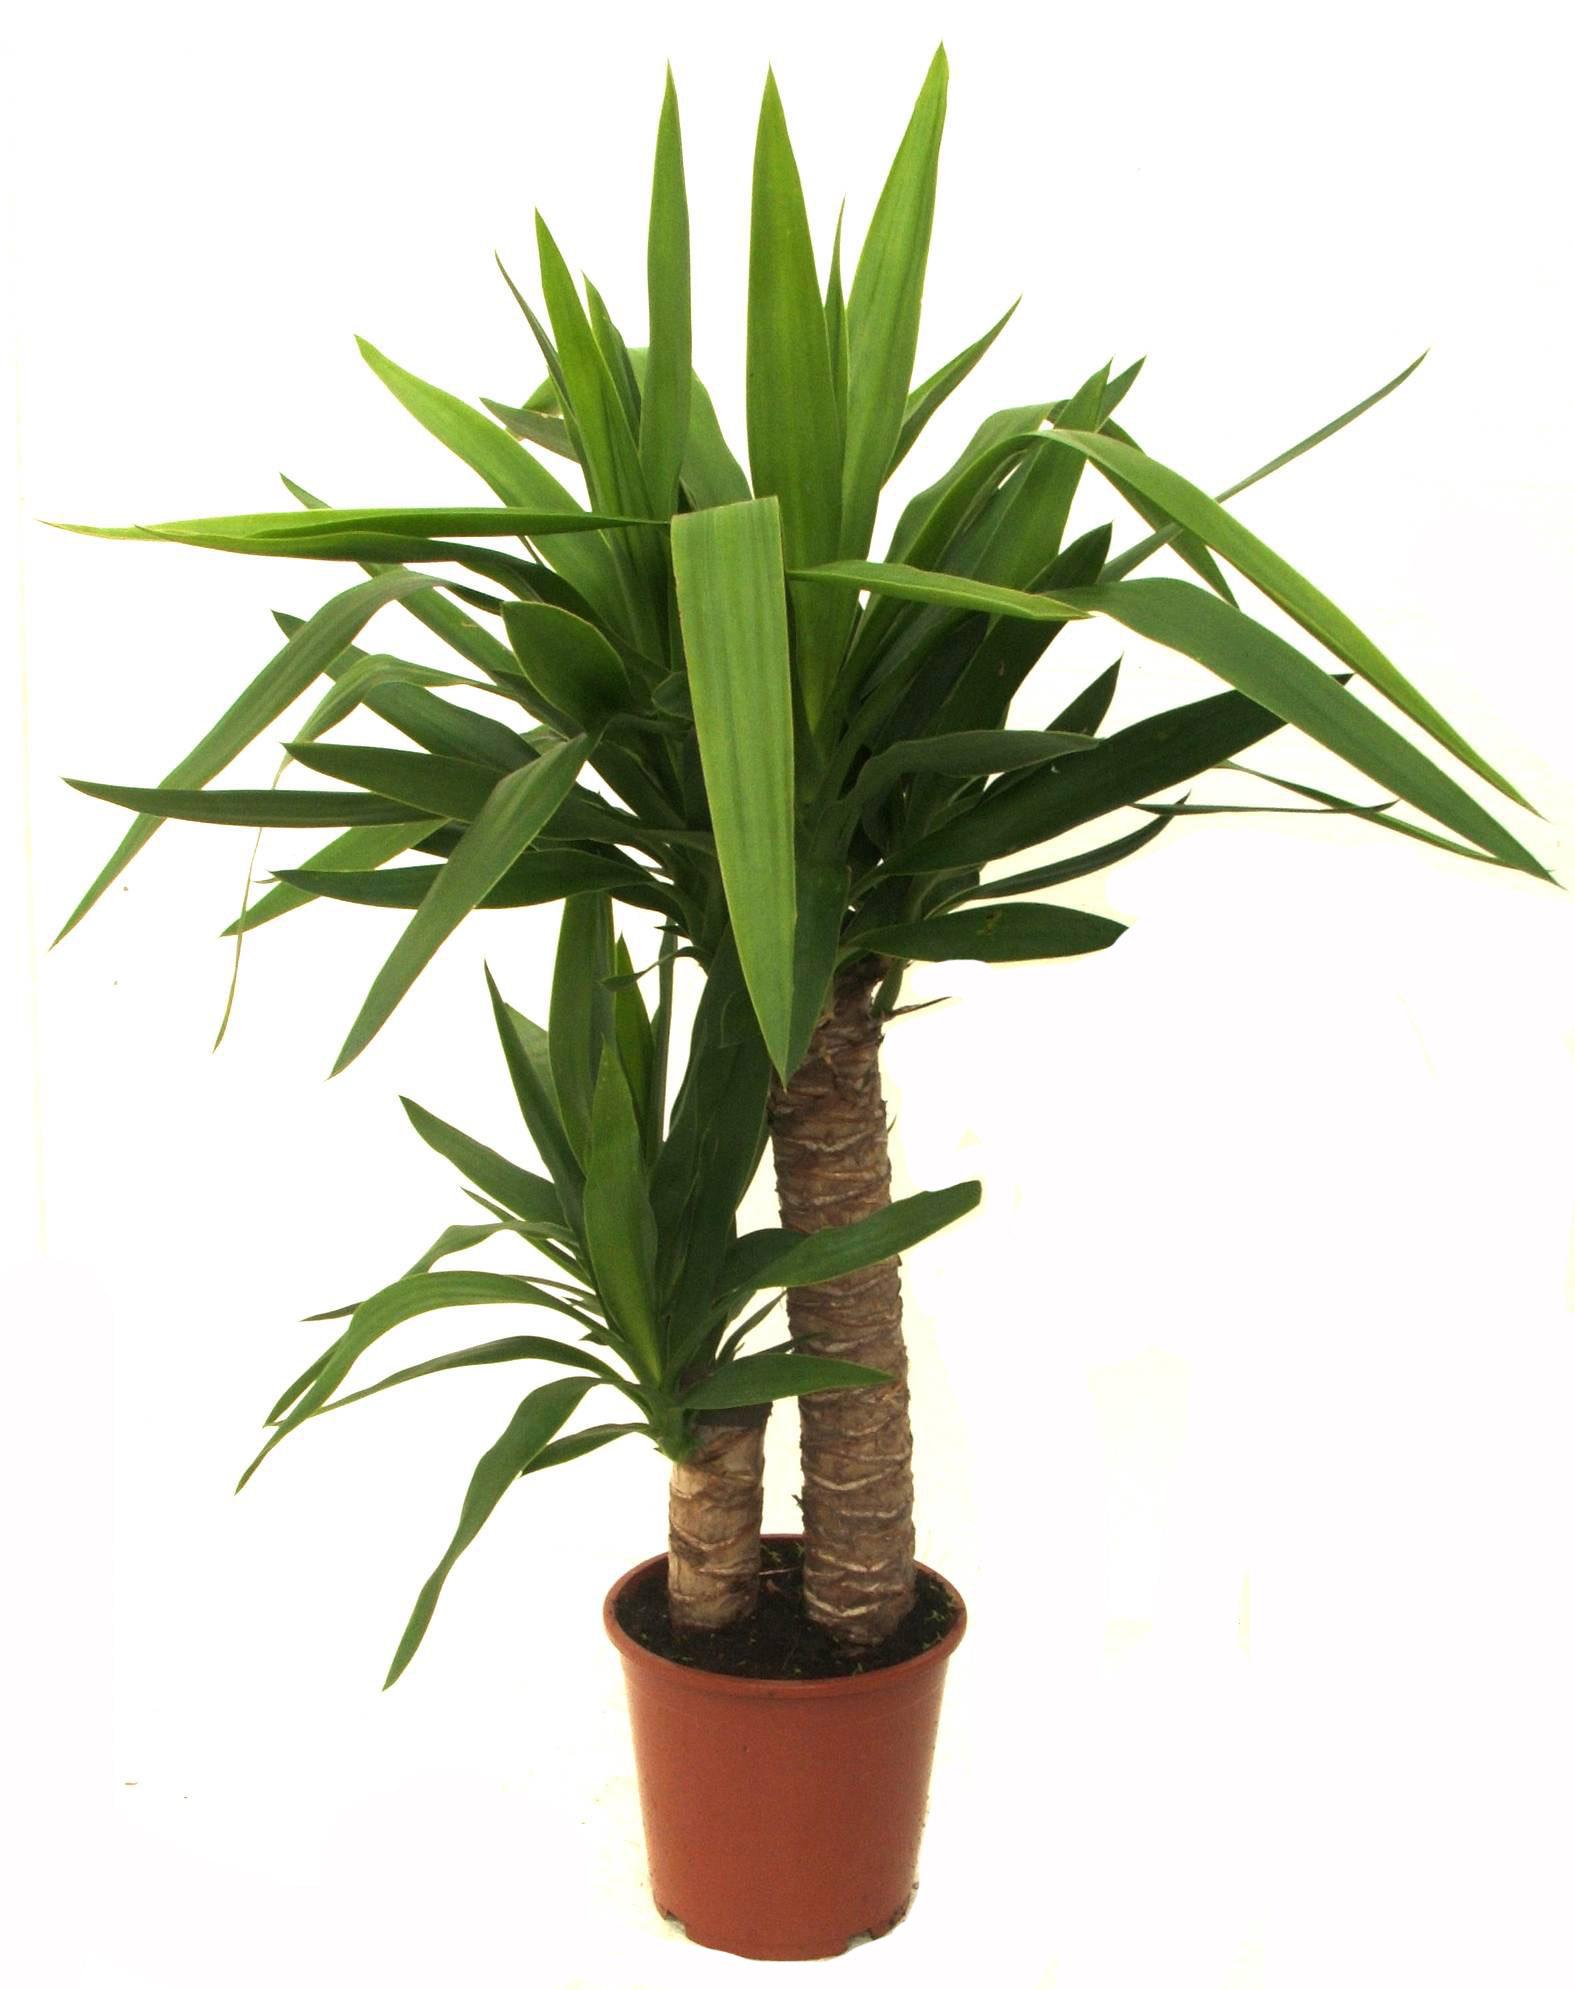 Цветок комнатная пальма уход в домашних условиях